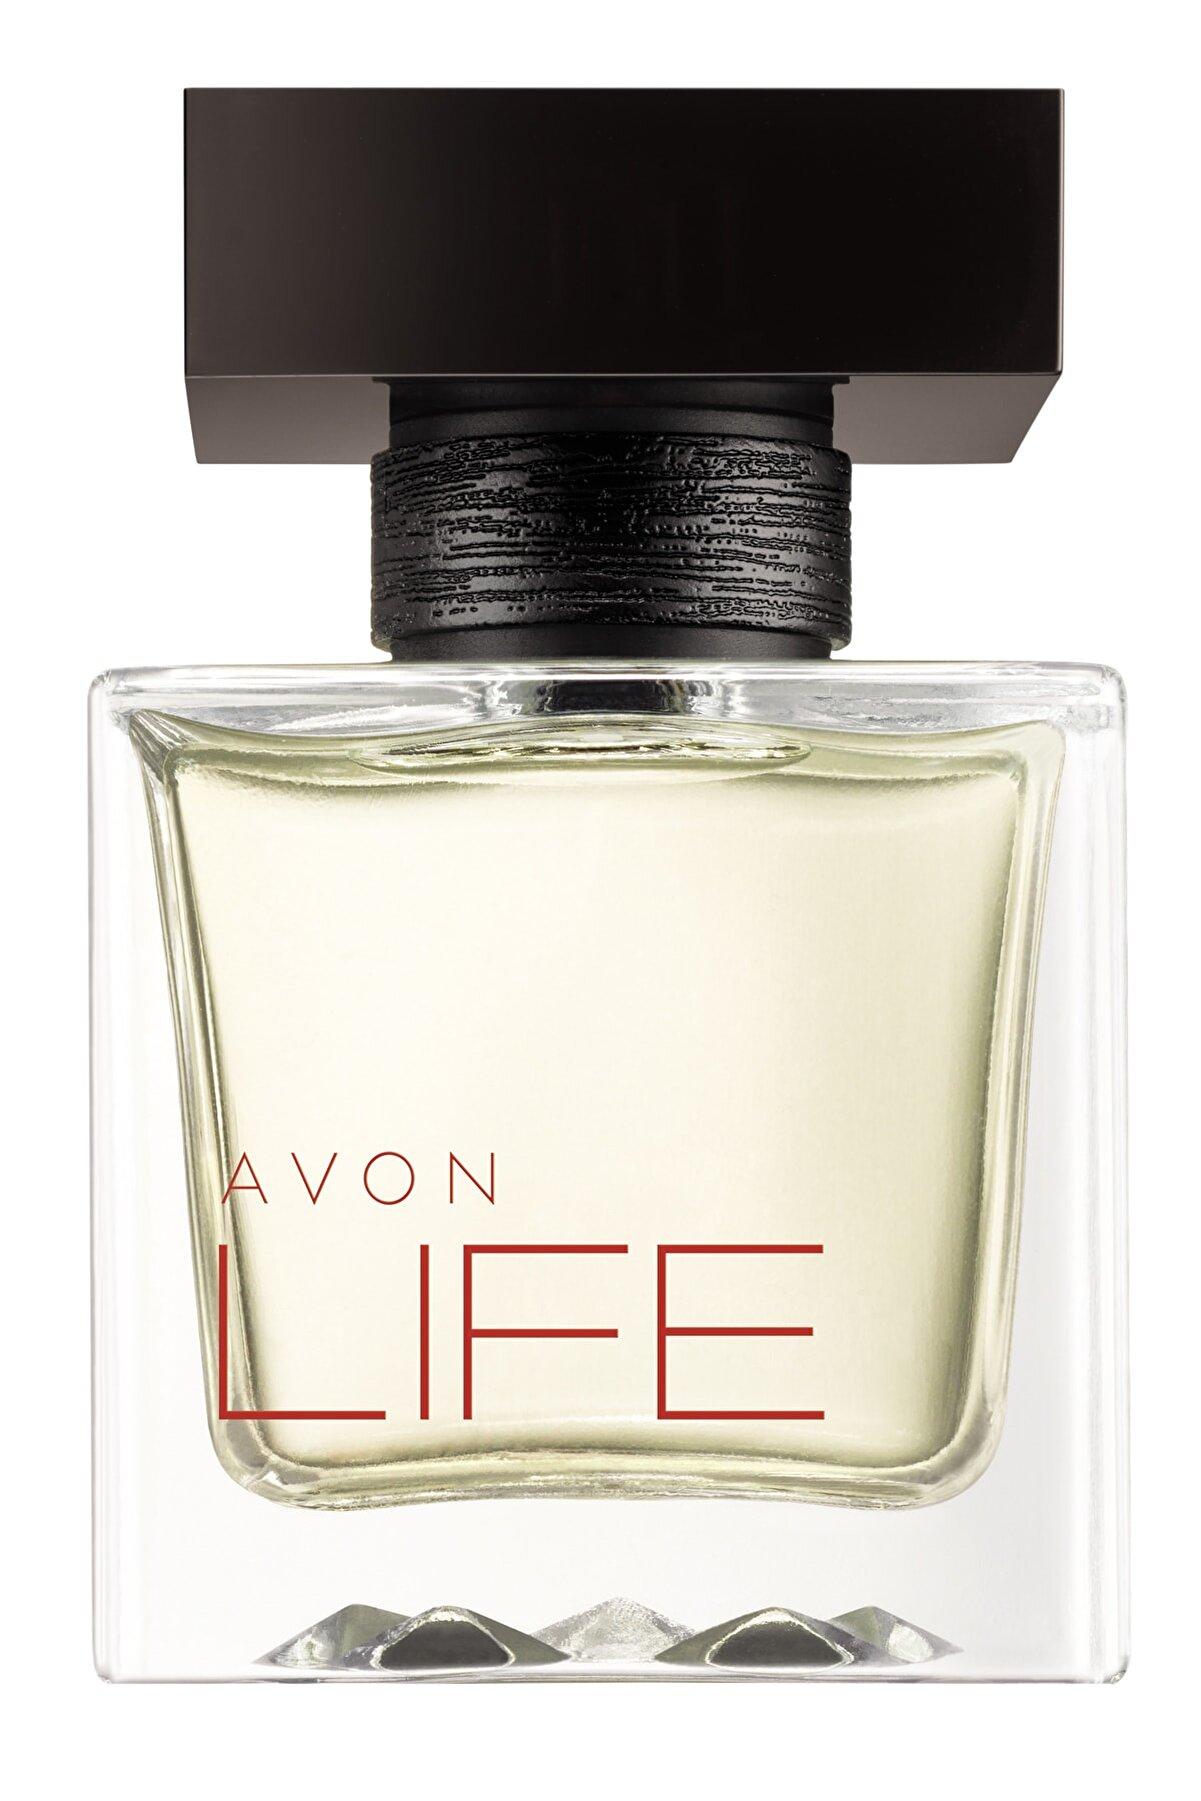 Avon Life by Kenzo Takada Erkek Edt 75 ml Erkek Parfümü 5050136616137